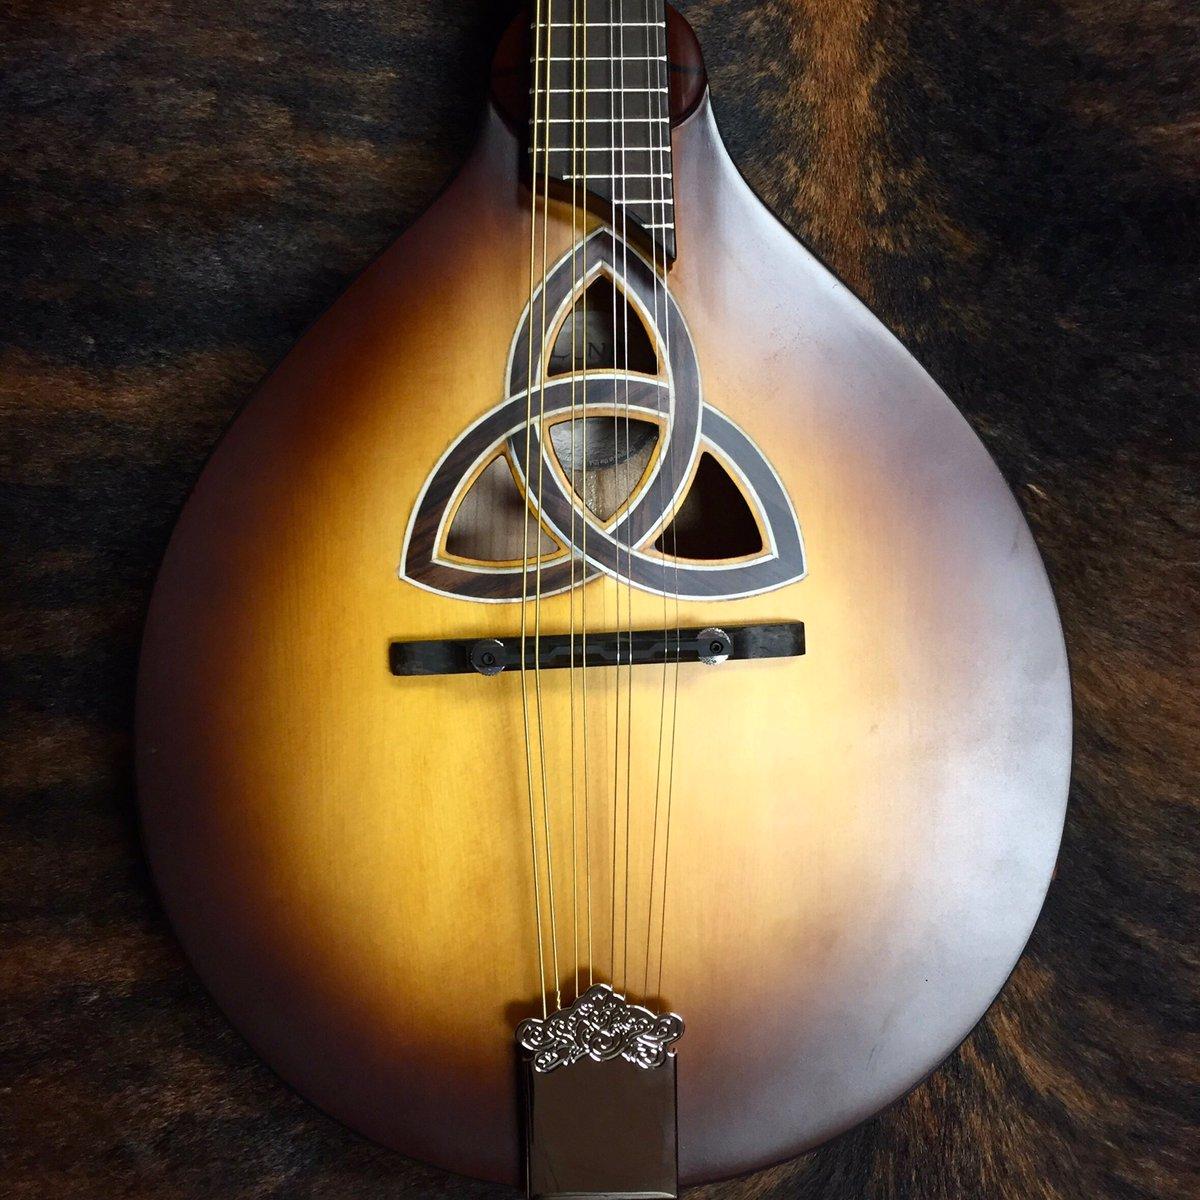 Covering Battle of Evermore? Do we have the perfect mandolin for you! • • #luna #mandolin #ledzeppelin #battleofevermore #gointocalifornia #bronyraur #tortiseshell #mandolincafe #eightstrings #acousticroom #redcouch #themusicfarmpic.twitter.com/s3EEQfZMM3